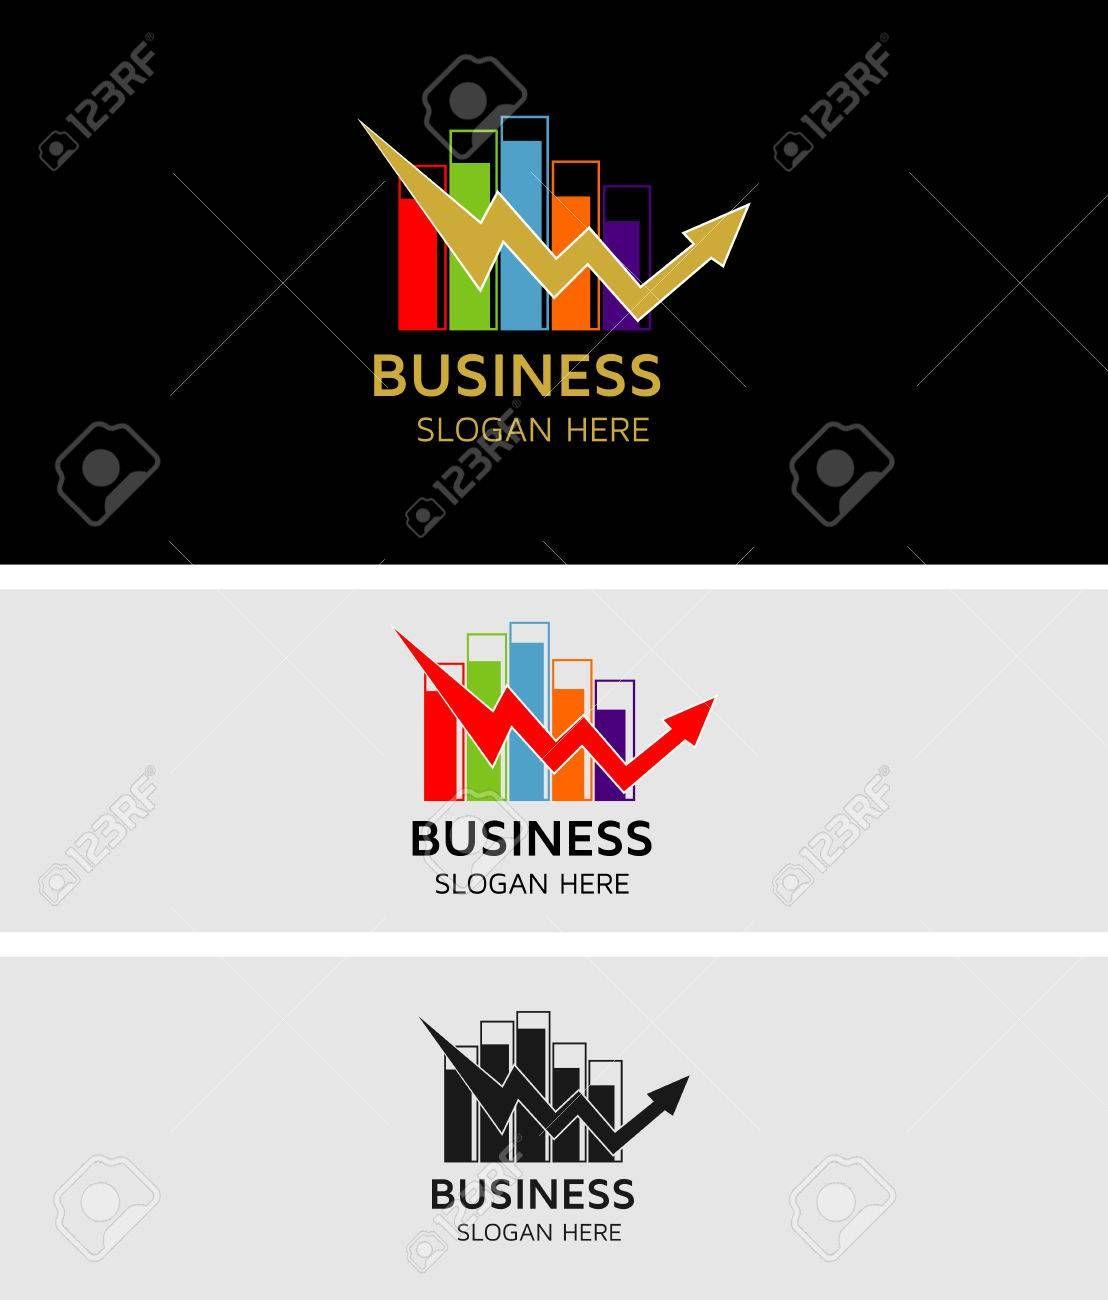 Business Stock Market Logo Ad Stock Business Logo Market Illustrator Inspiration Logos Art Inspiration